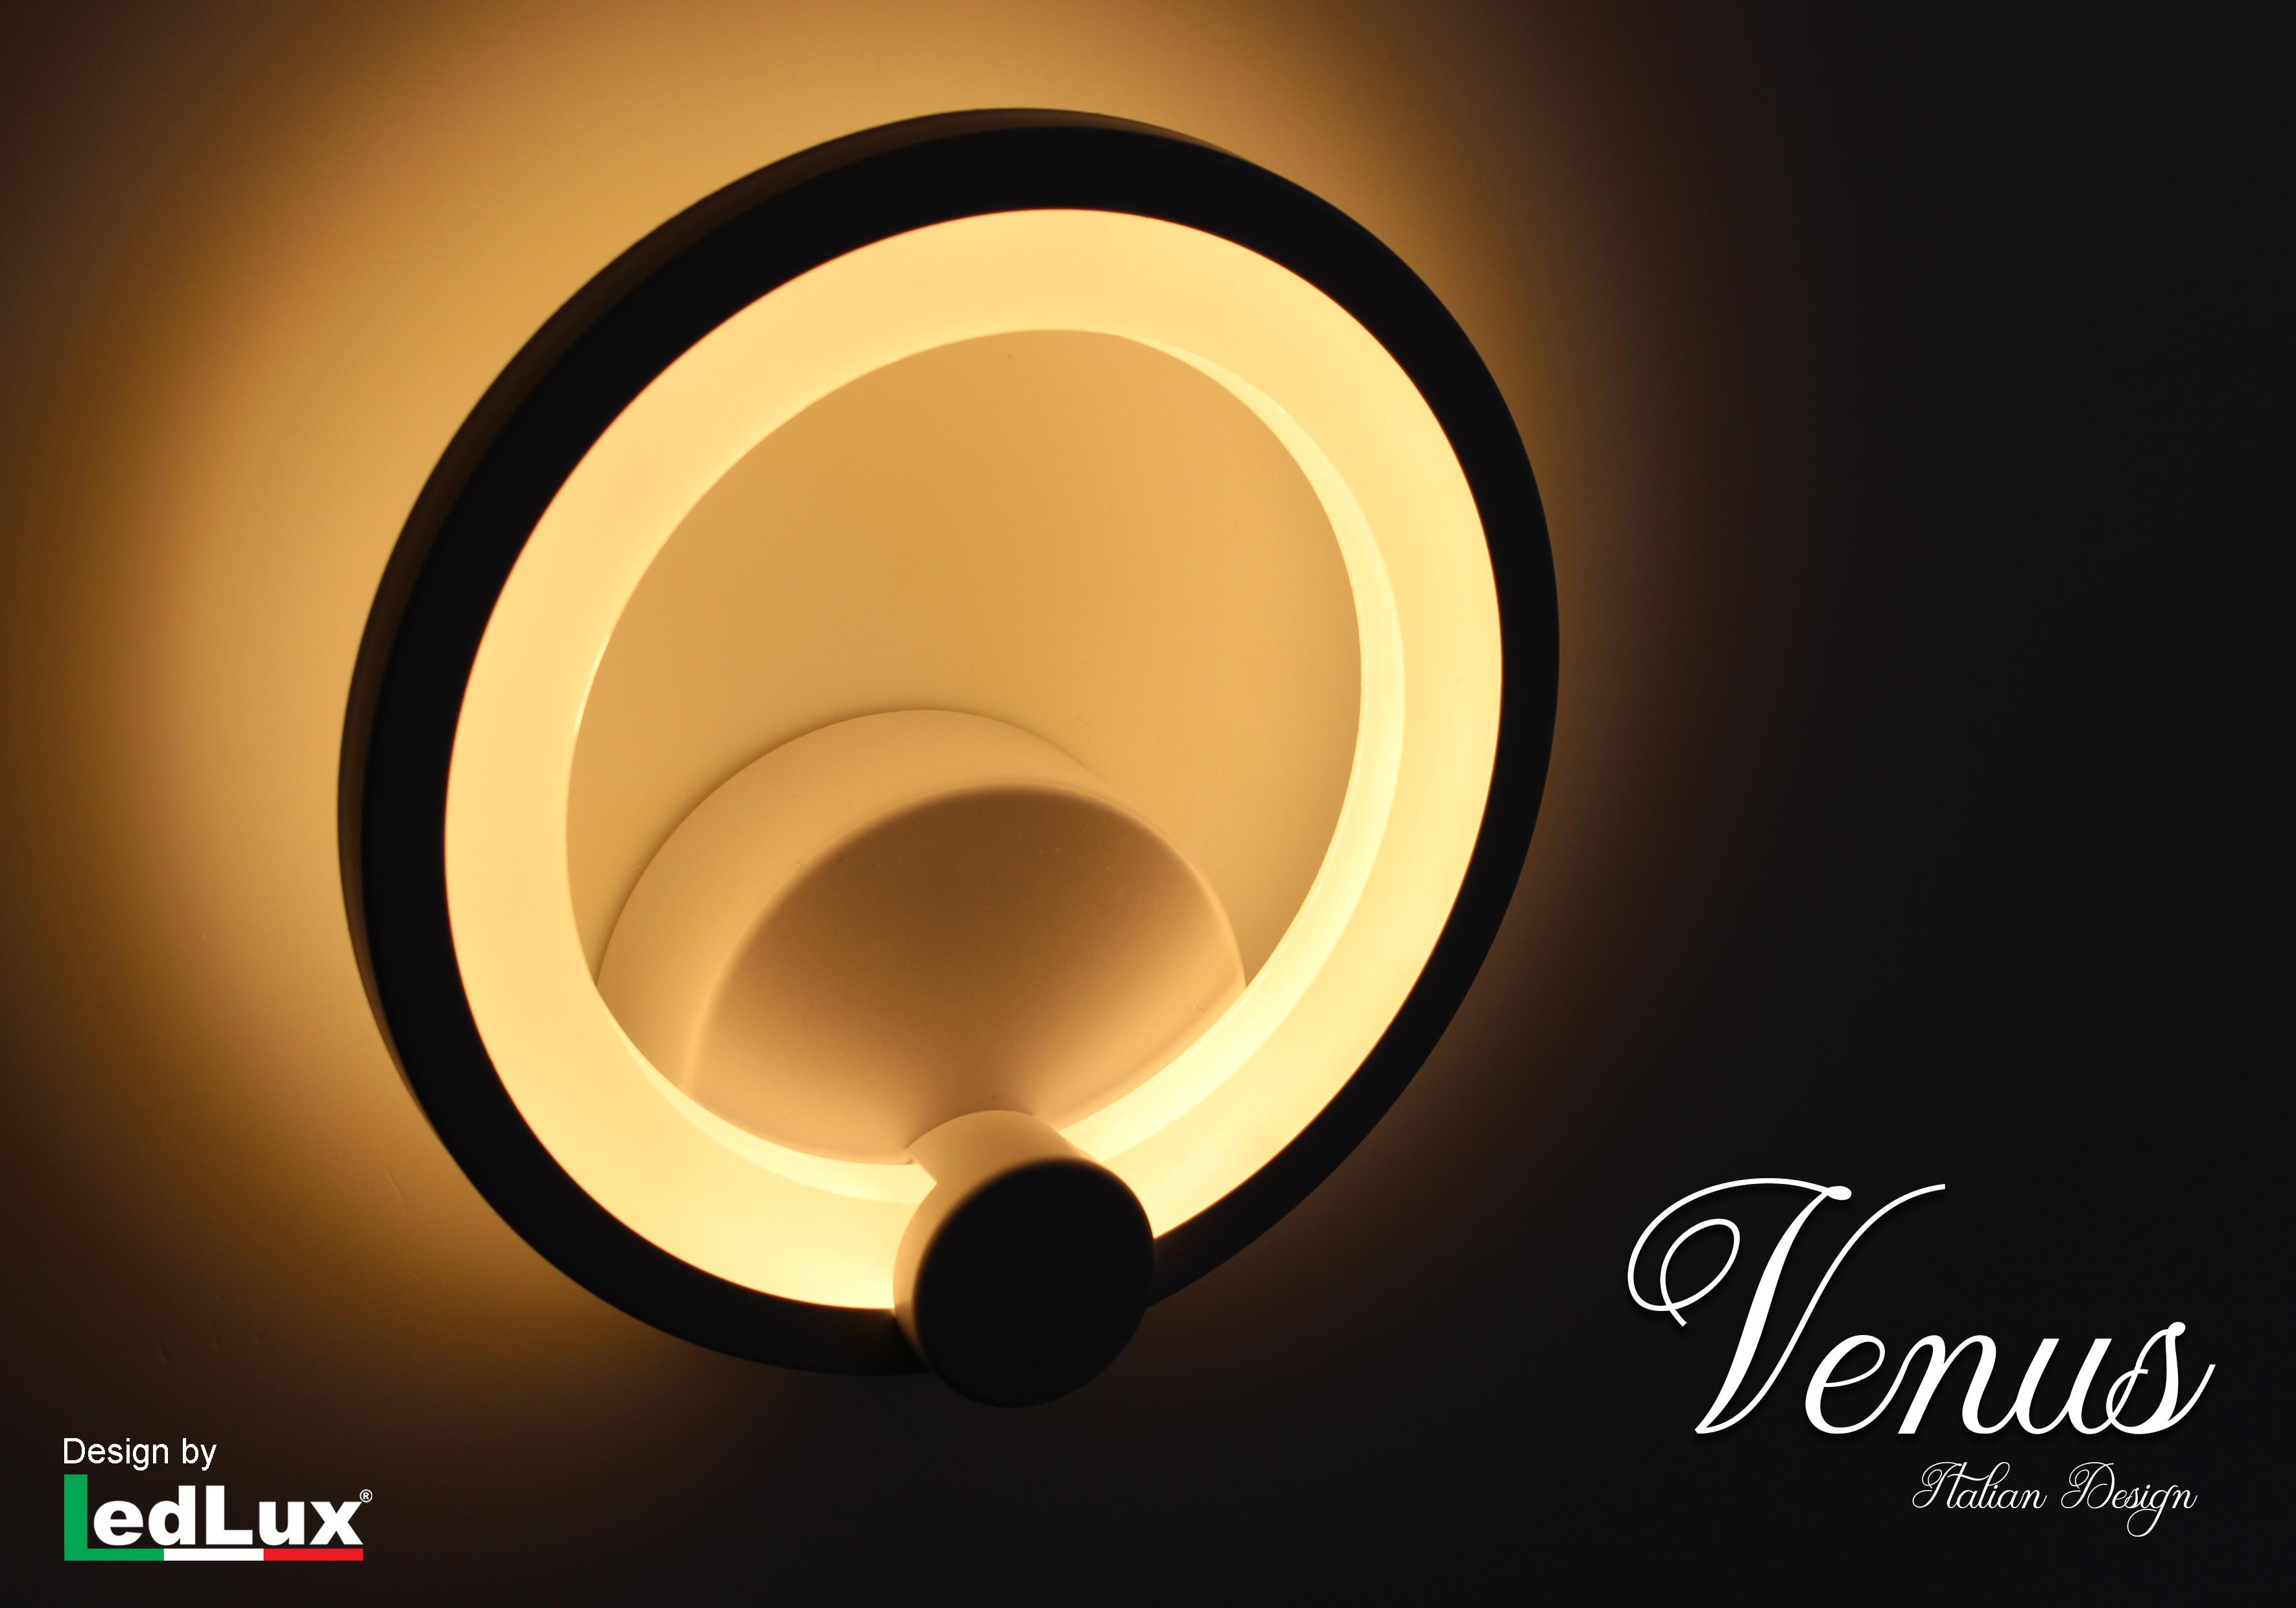 Applique Led Da Parete Modello Venus Italian Design Moderna 10W Bianco Caldo - PZ